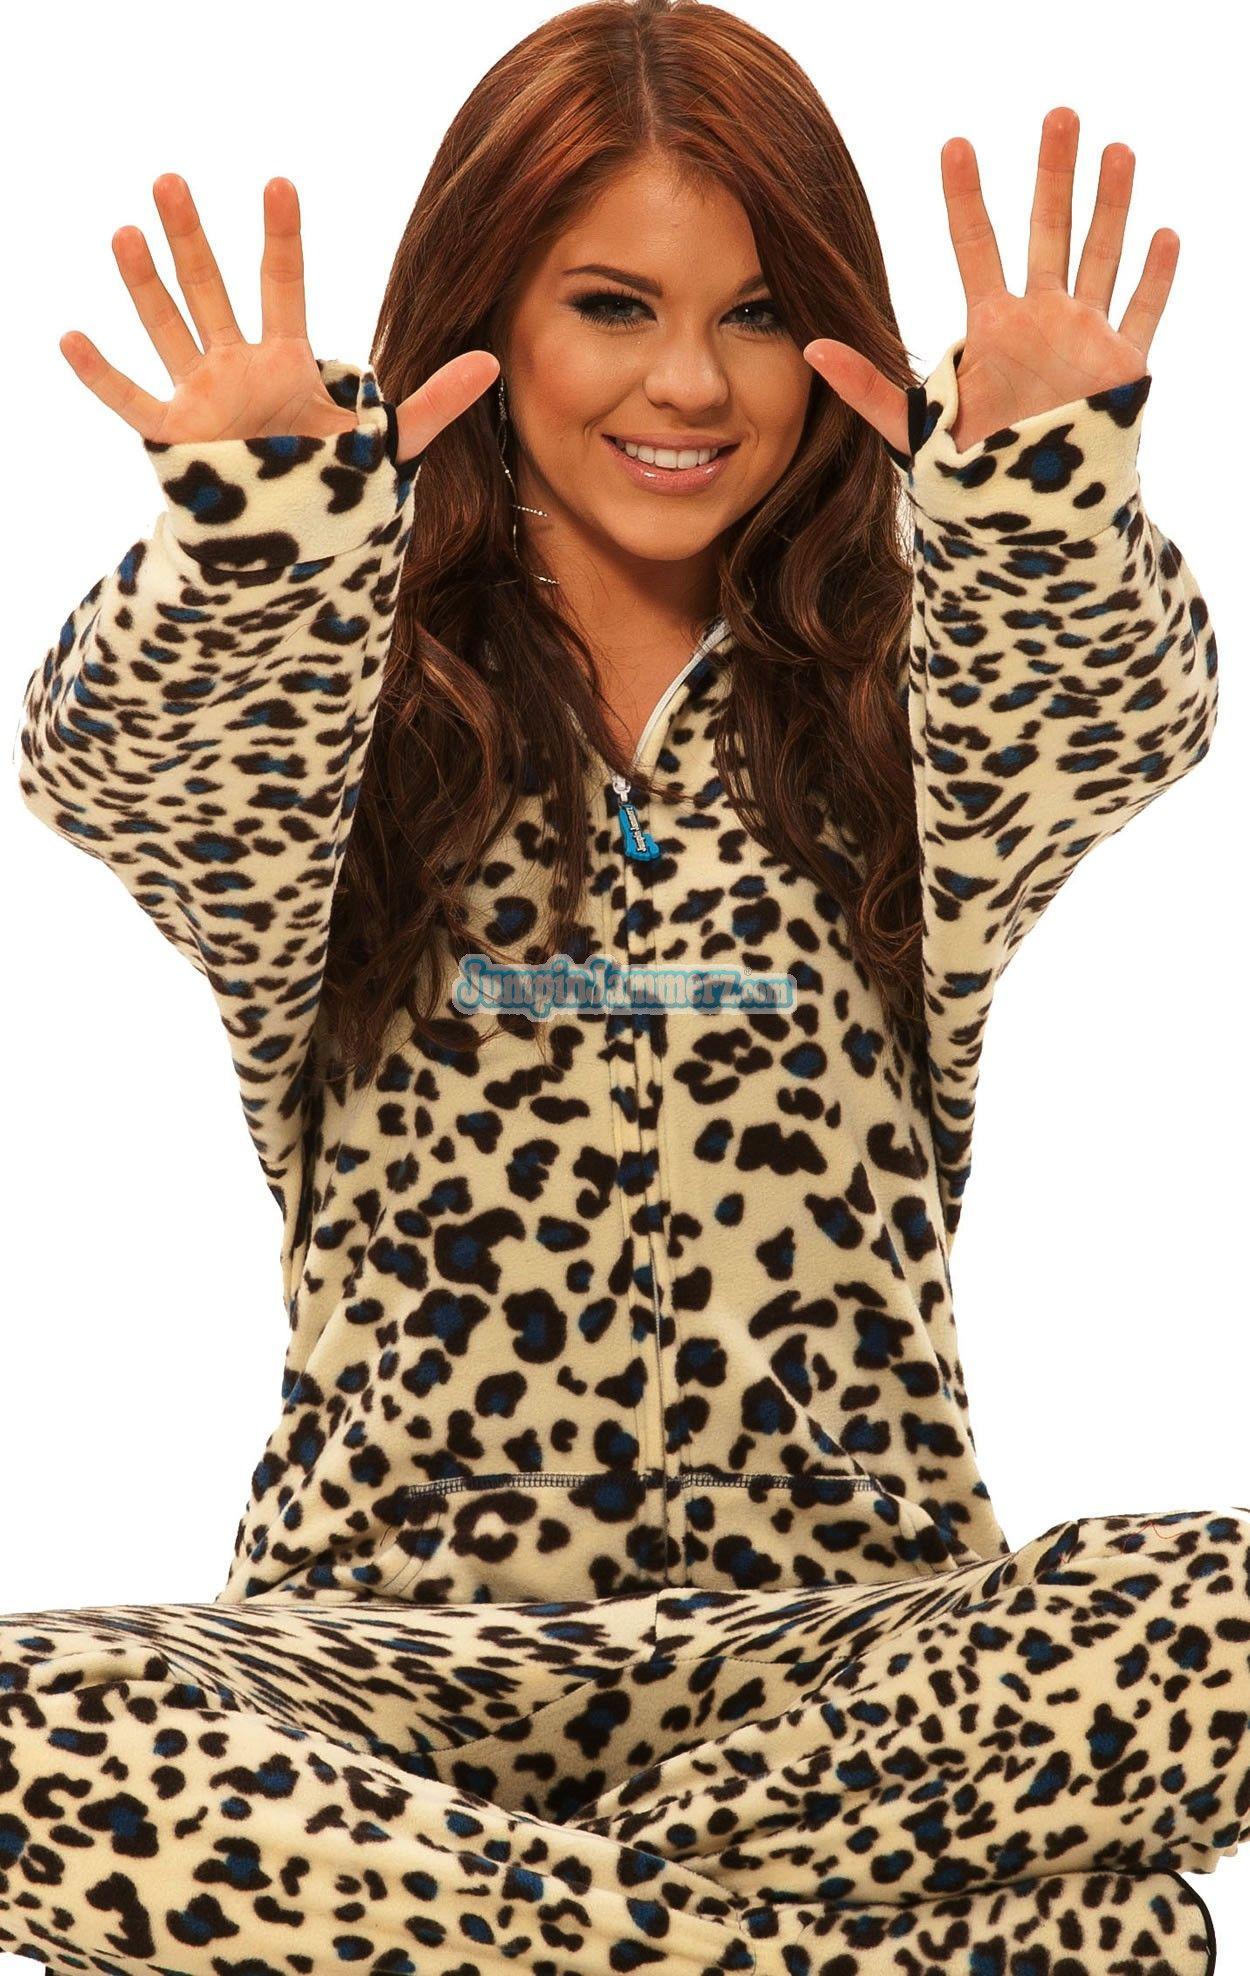 loading fleece sleeper pjs piece pajamas girl baby v one oshkosh zoom sleepers